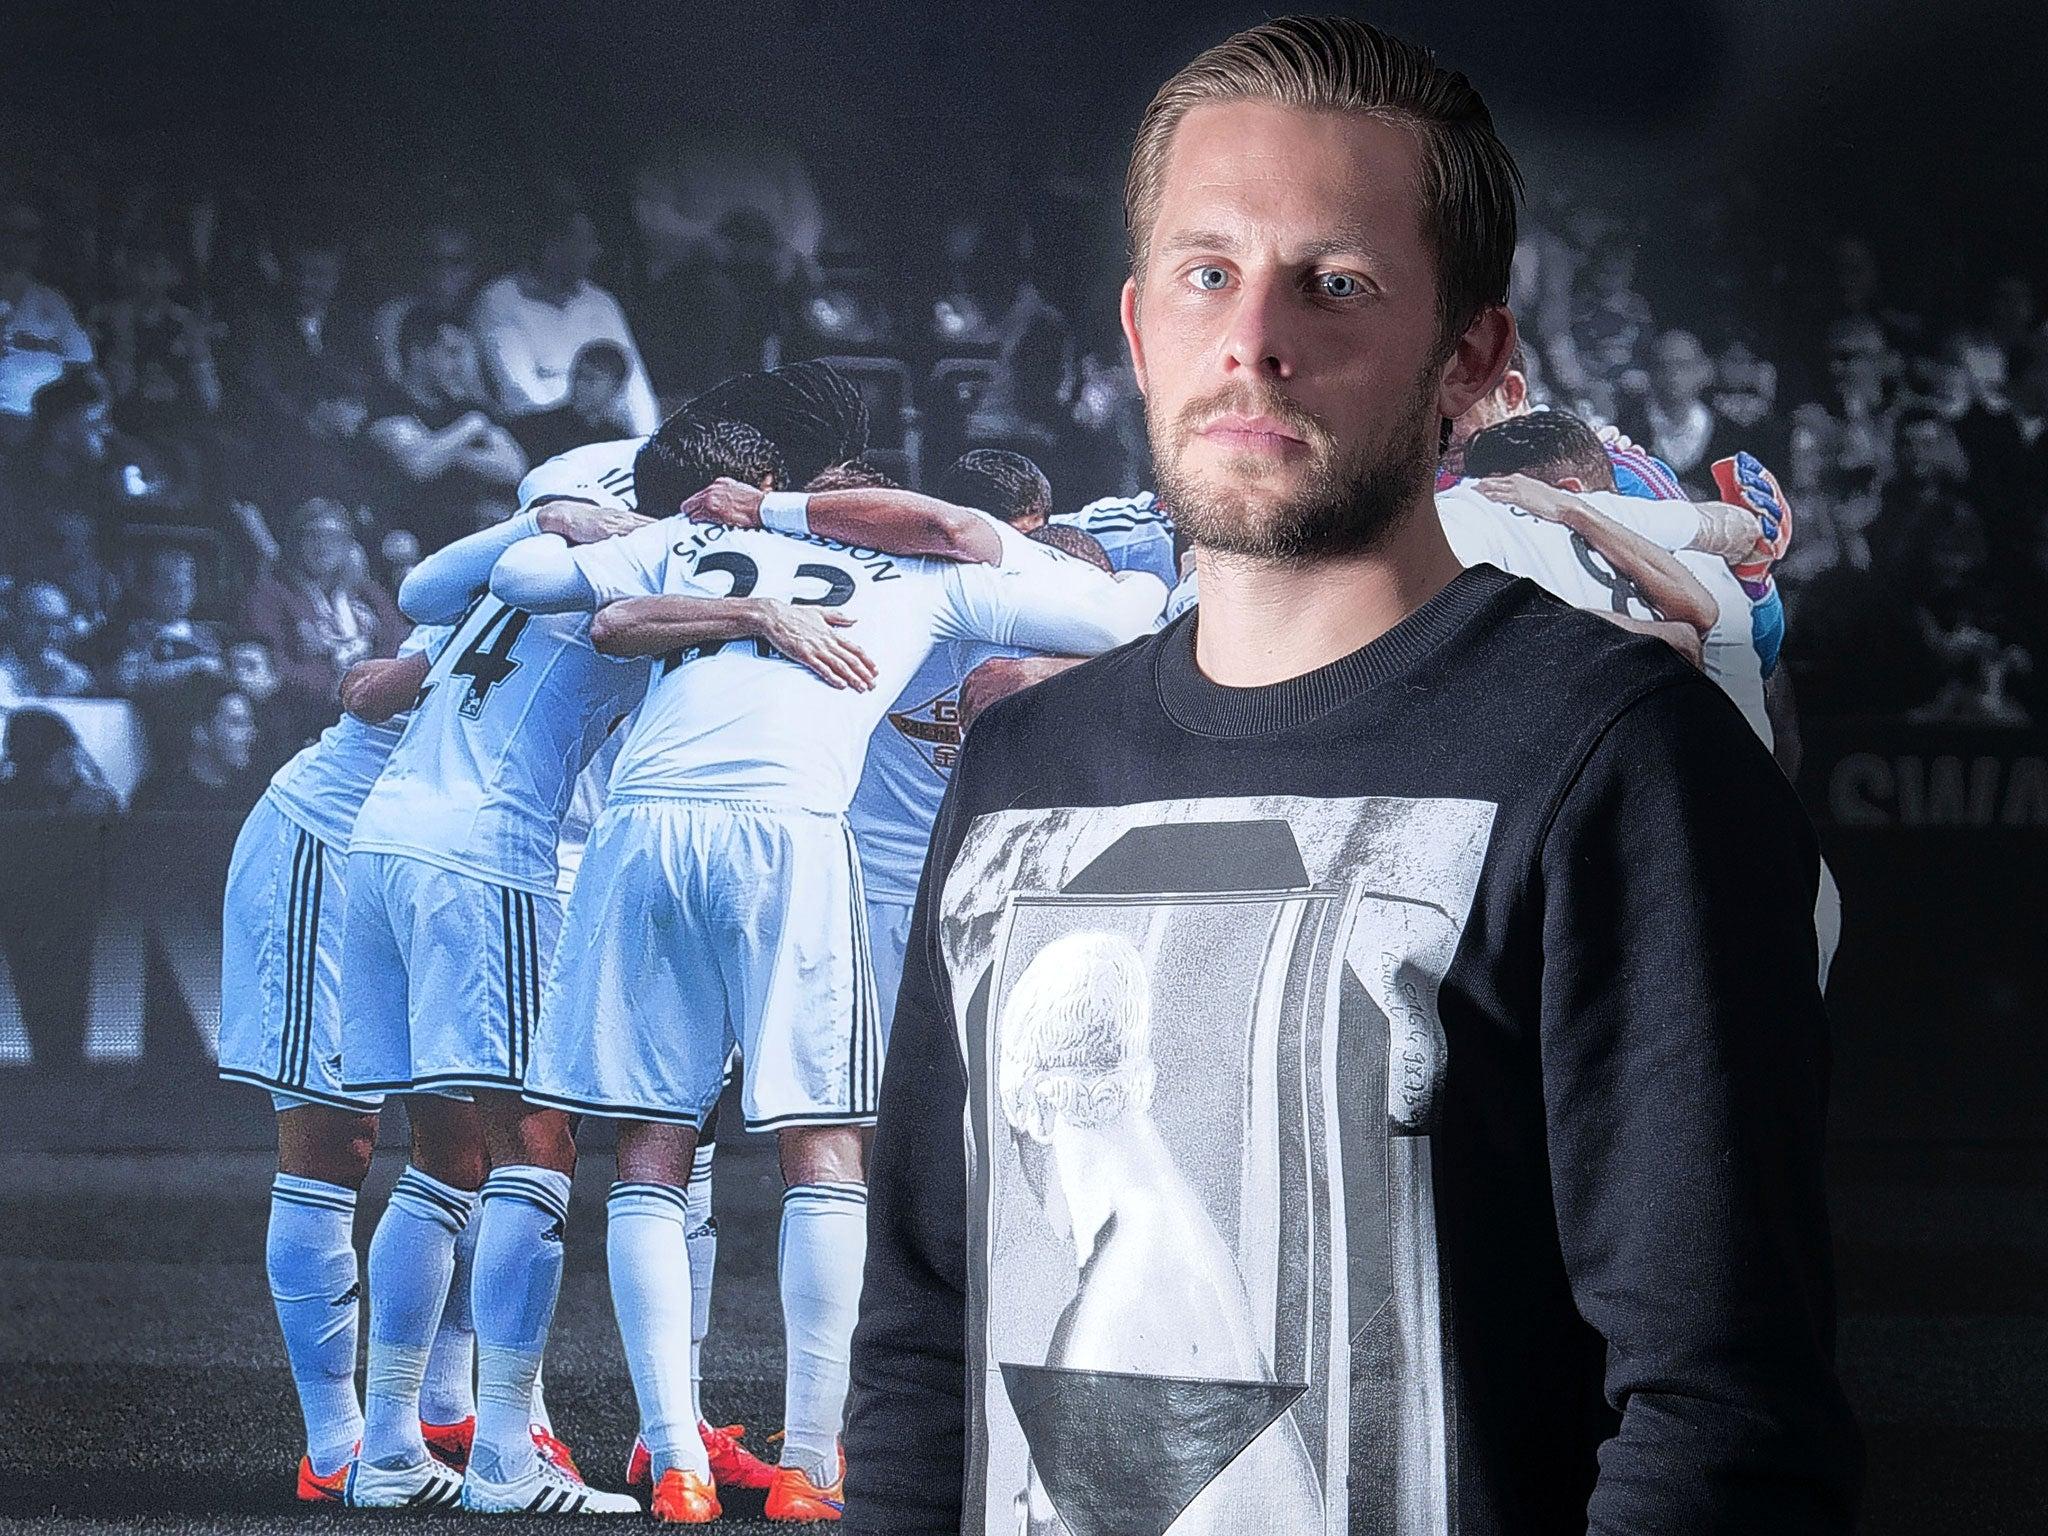 Swansea vs Manchester United Gylfi Sigurdsson living the dream